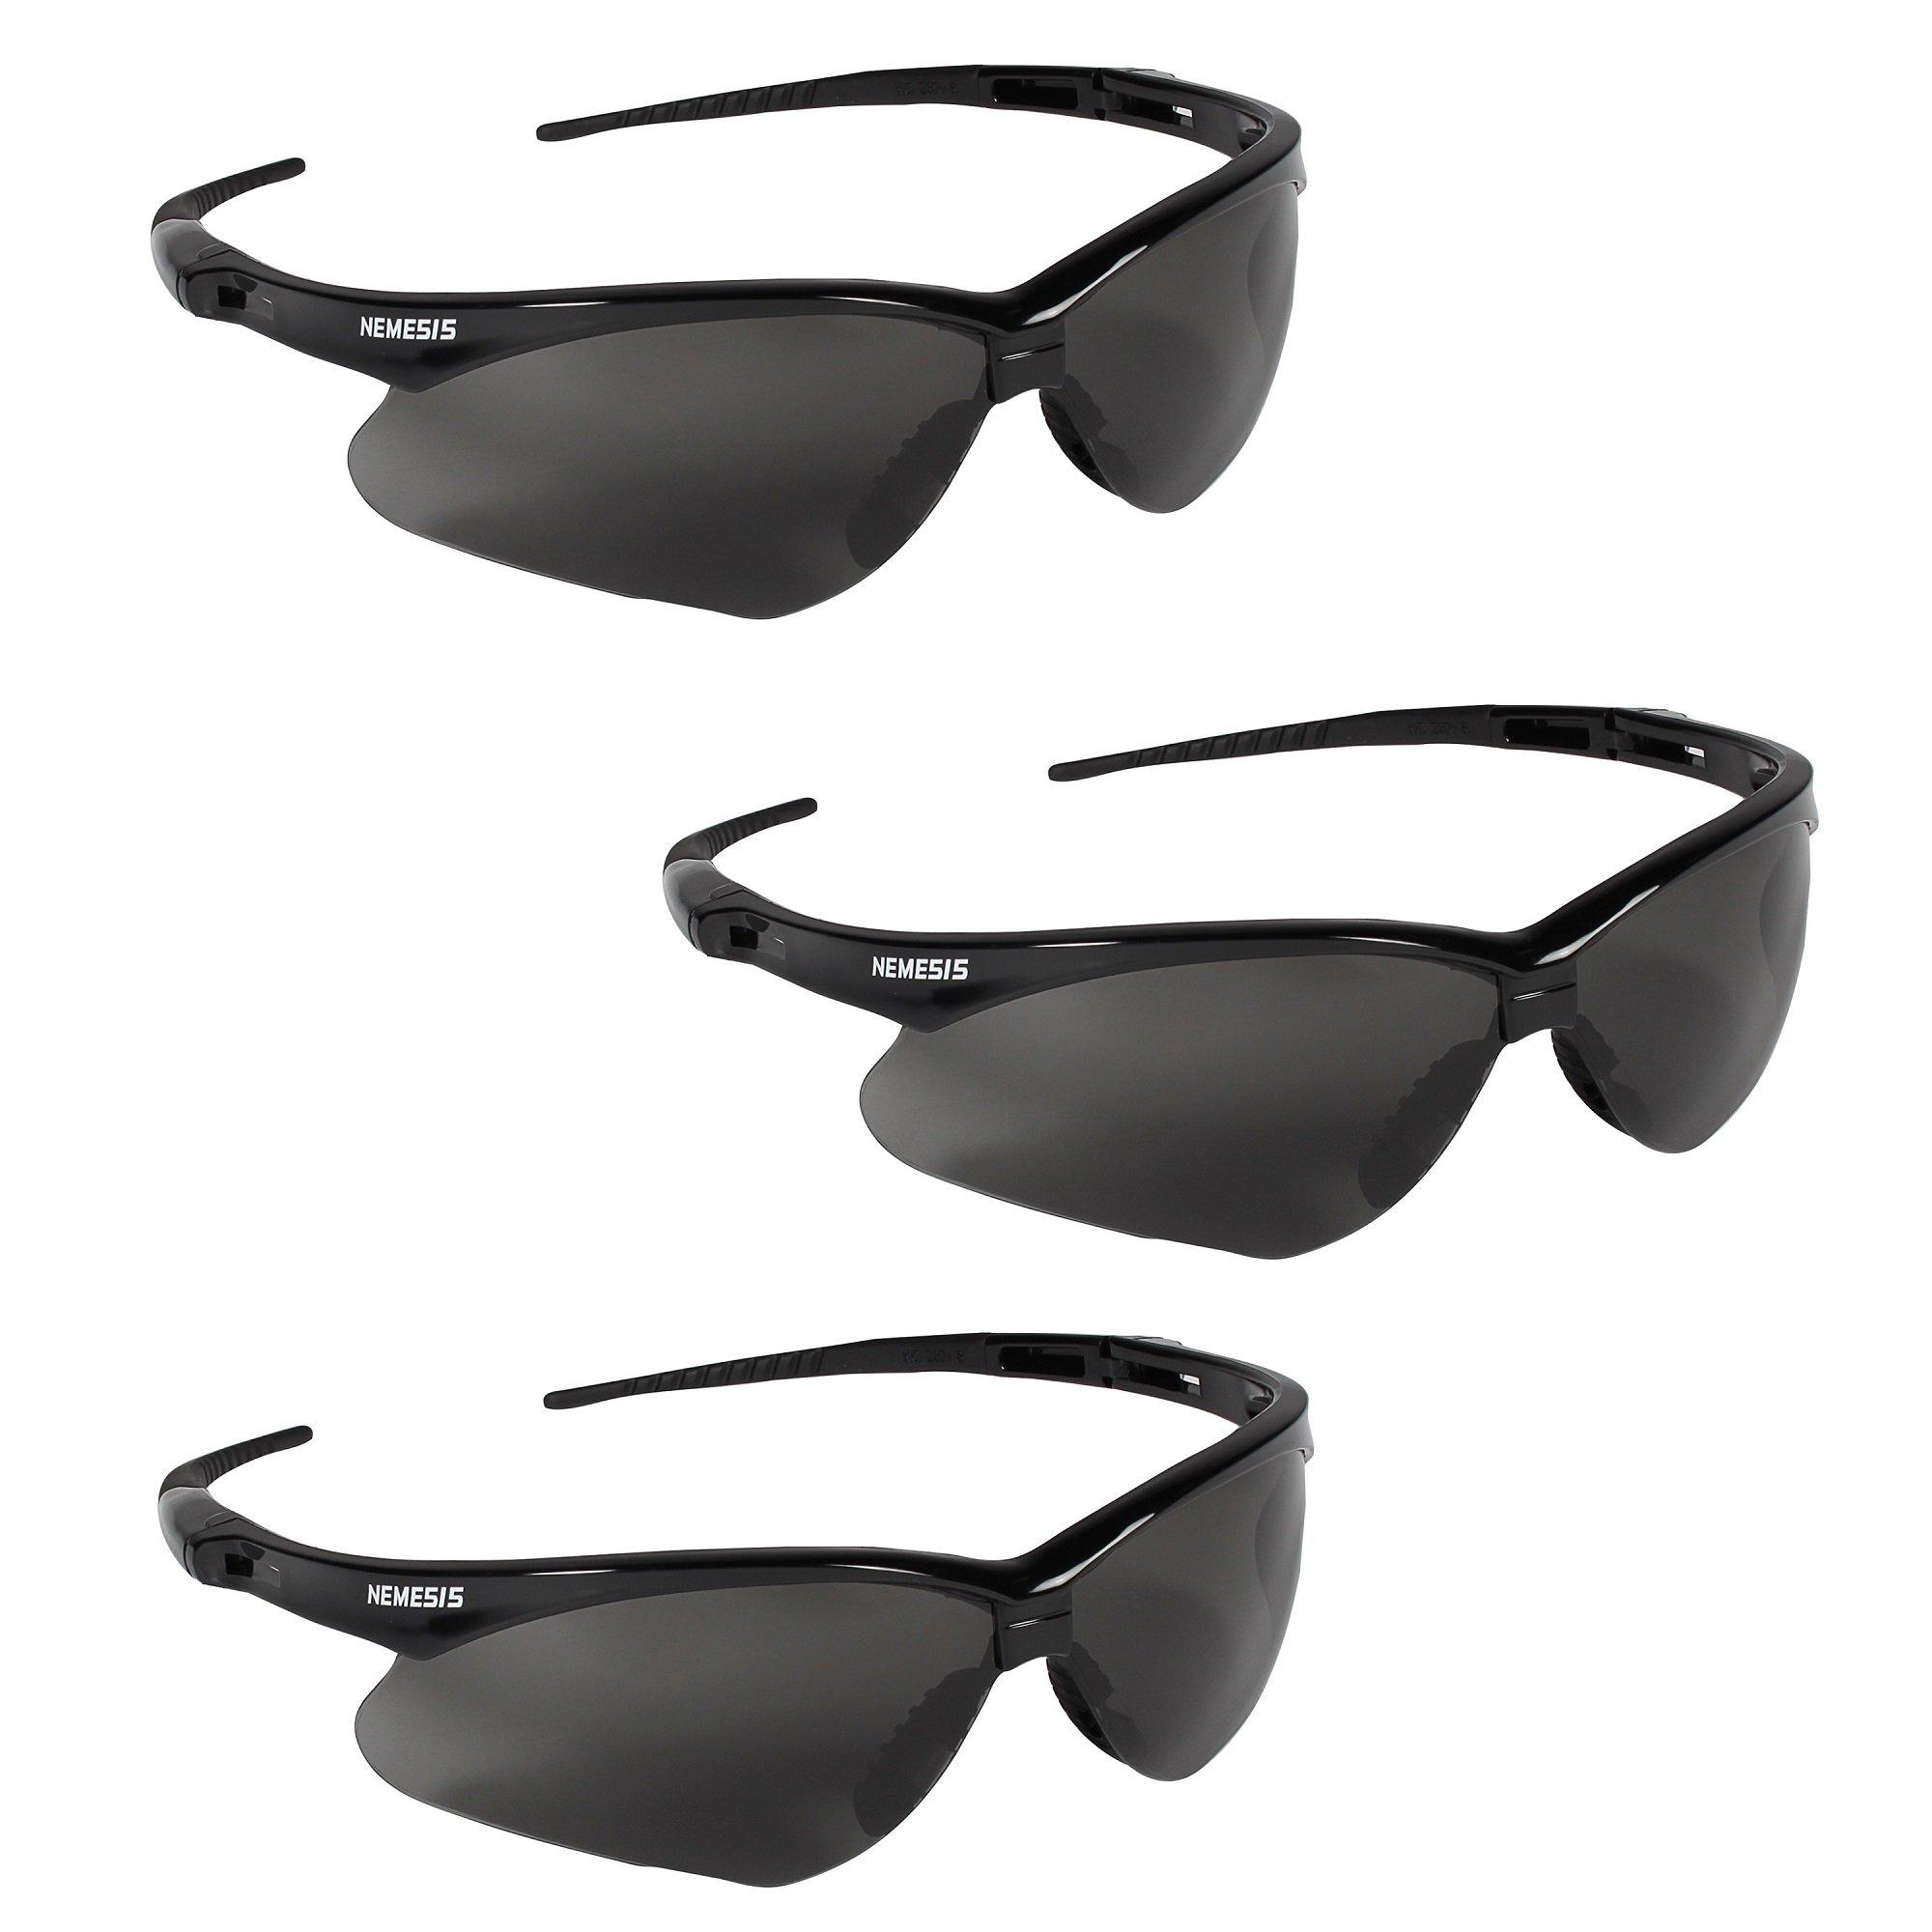 Jackson Safety V30 22475 Nemesis Safety Glasses 3020121 (3 Pair) (Black Frame with Smoke Anti-Fog Lens) by Jackson Nemesis